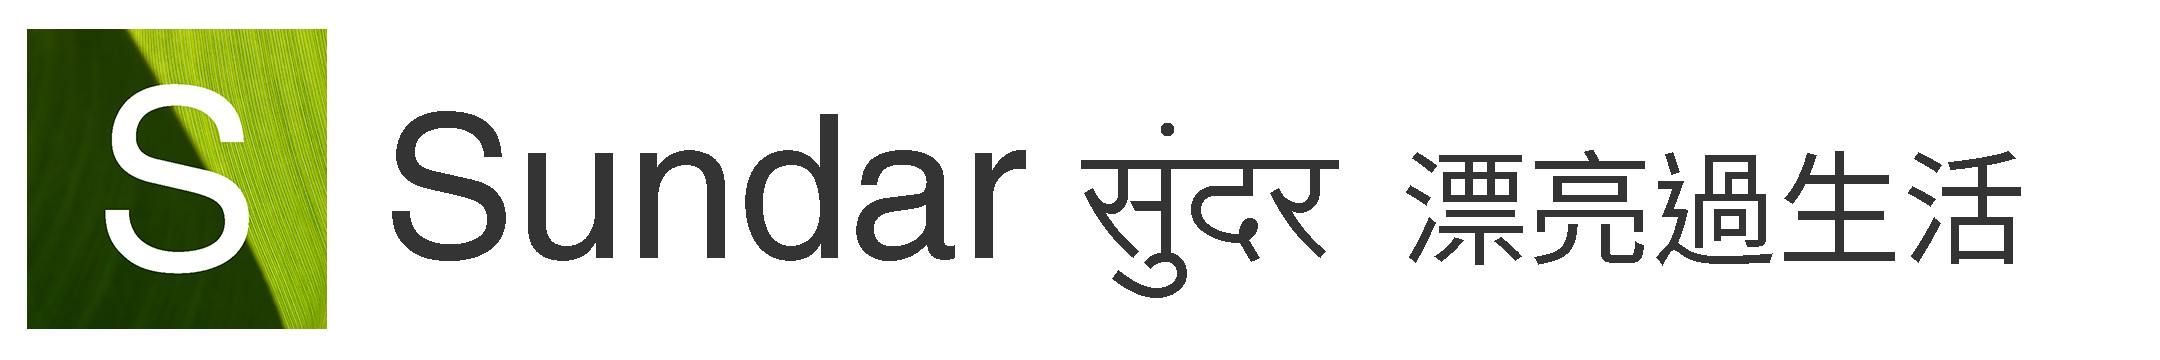 Sundar logo 03